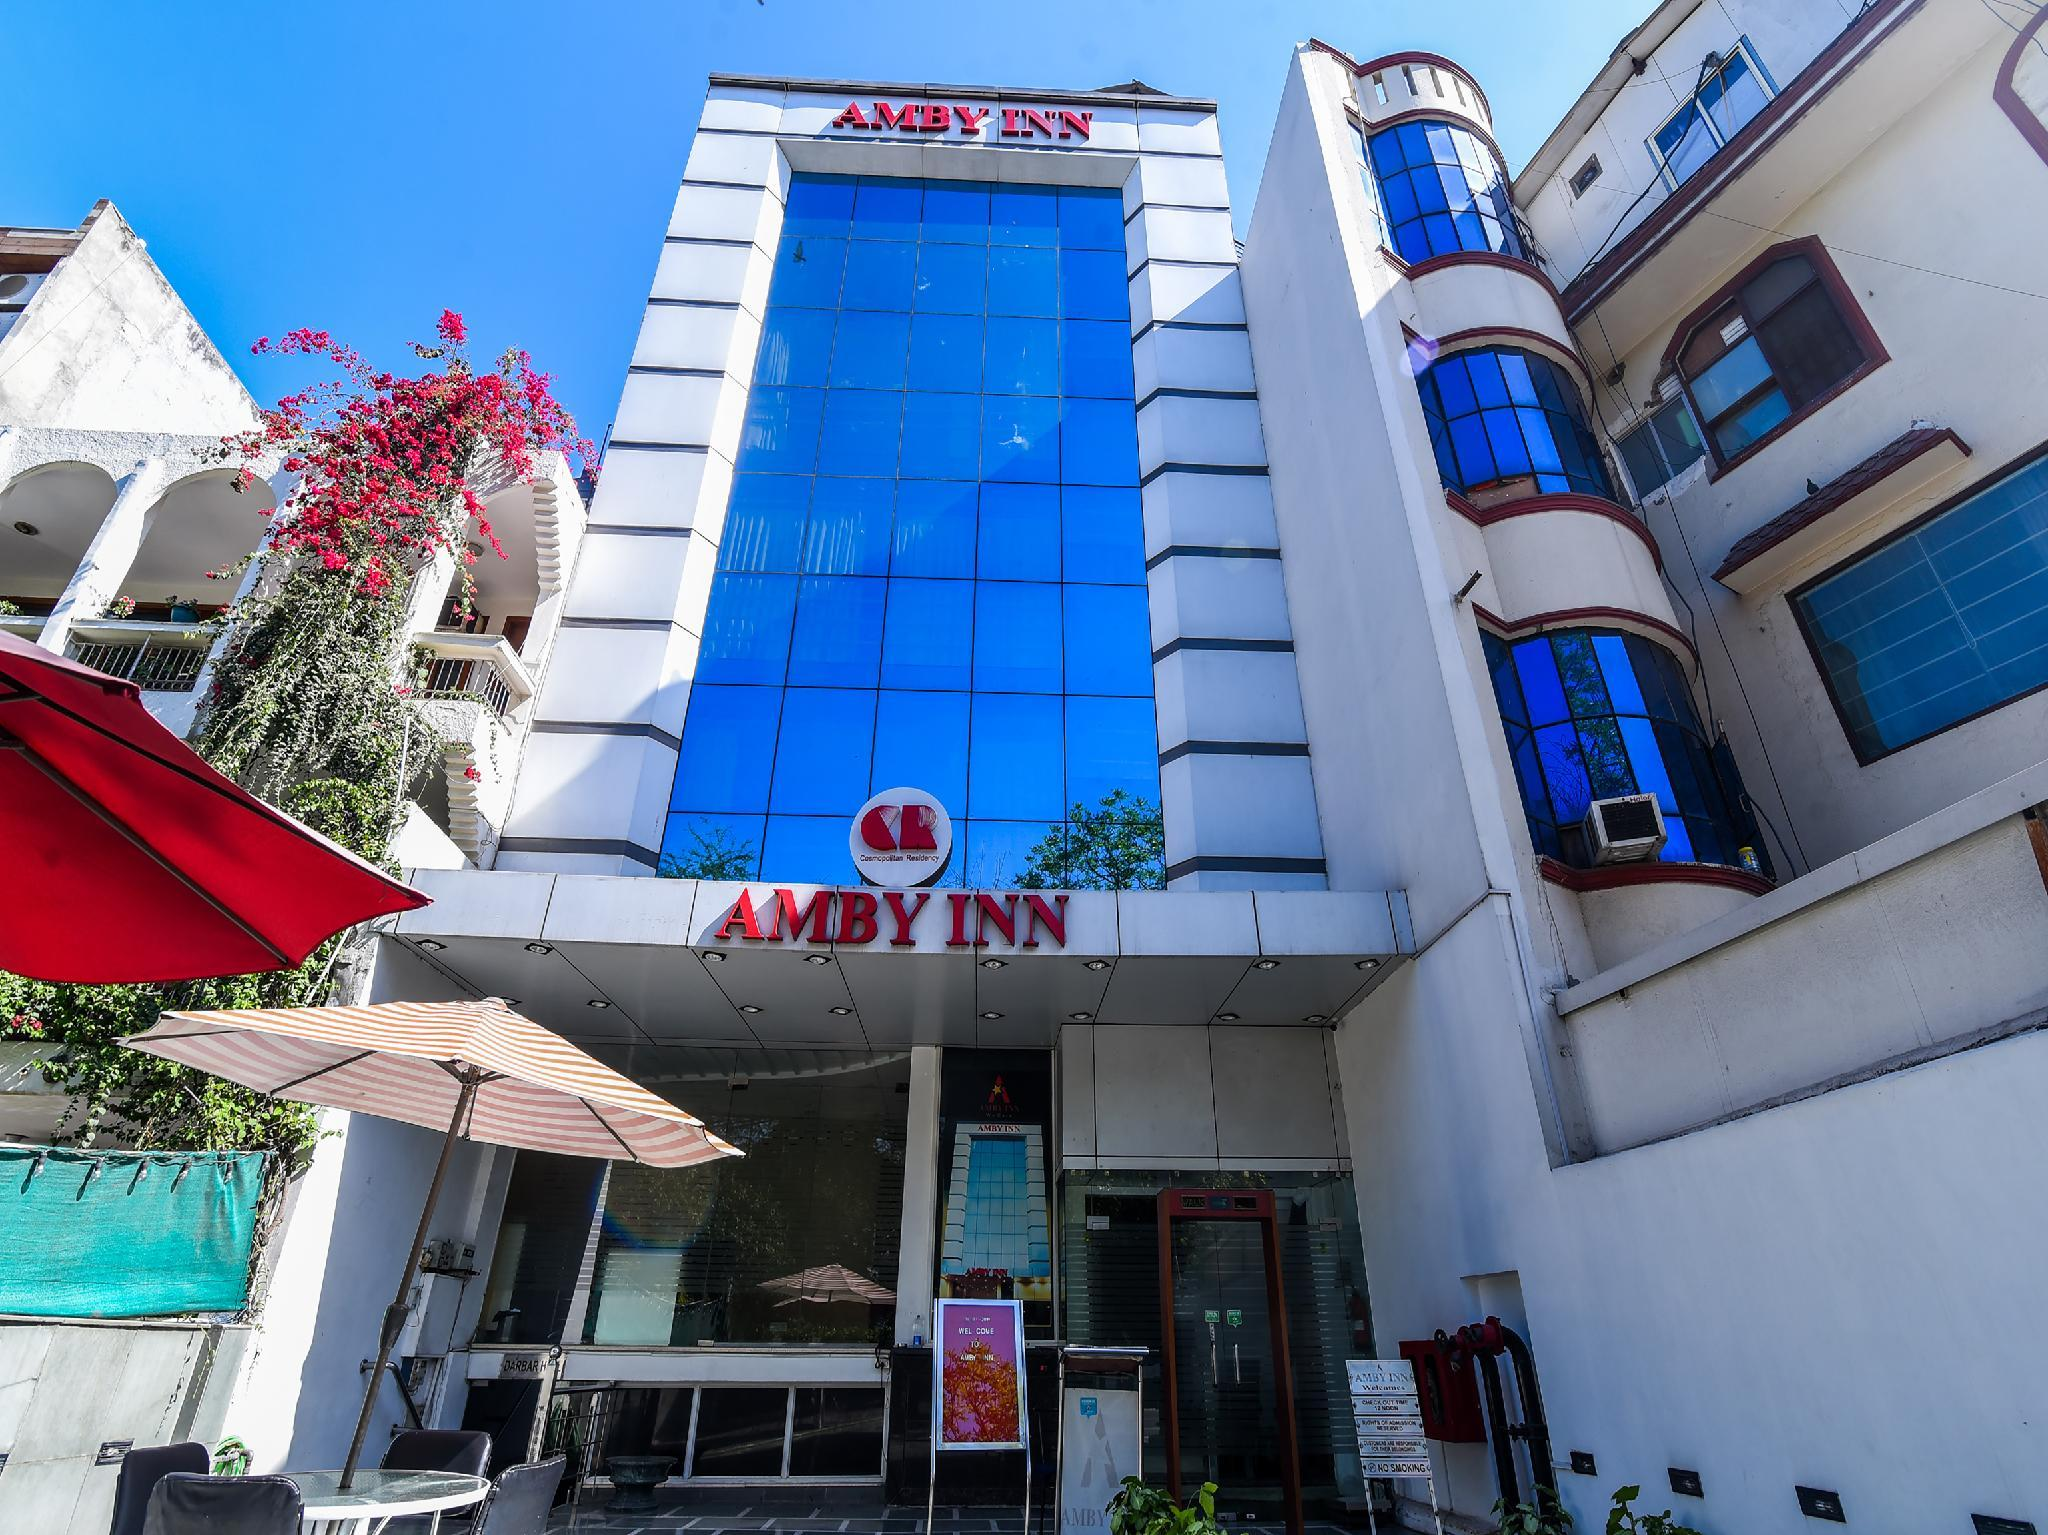 Capital O 1245 Hotel Amby Inn